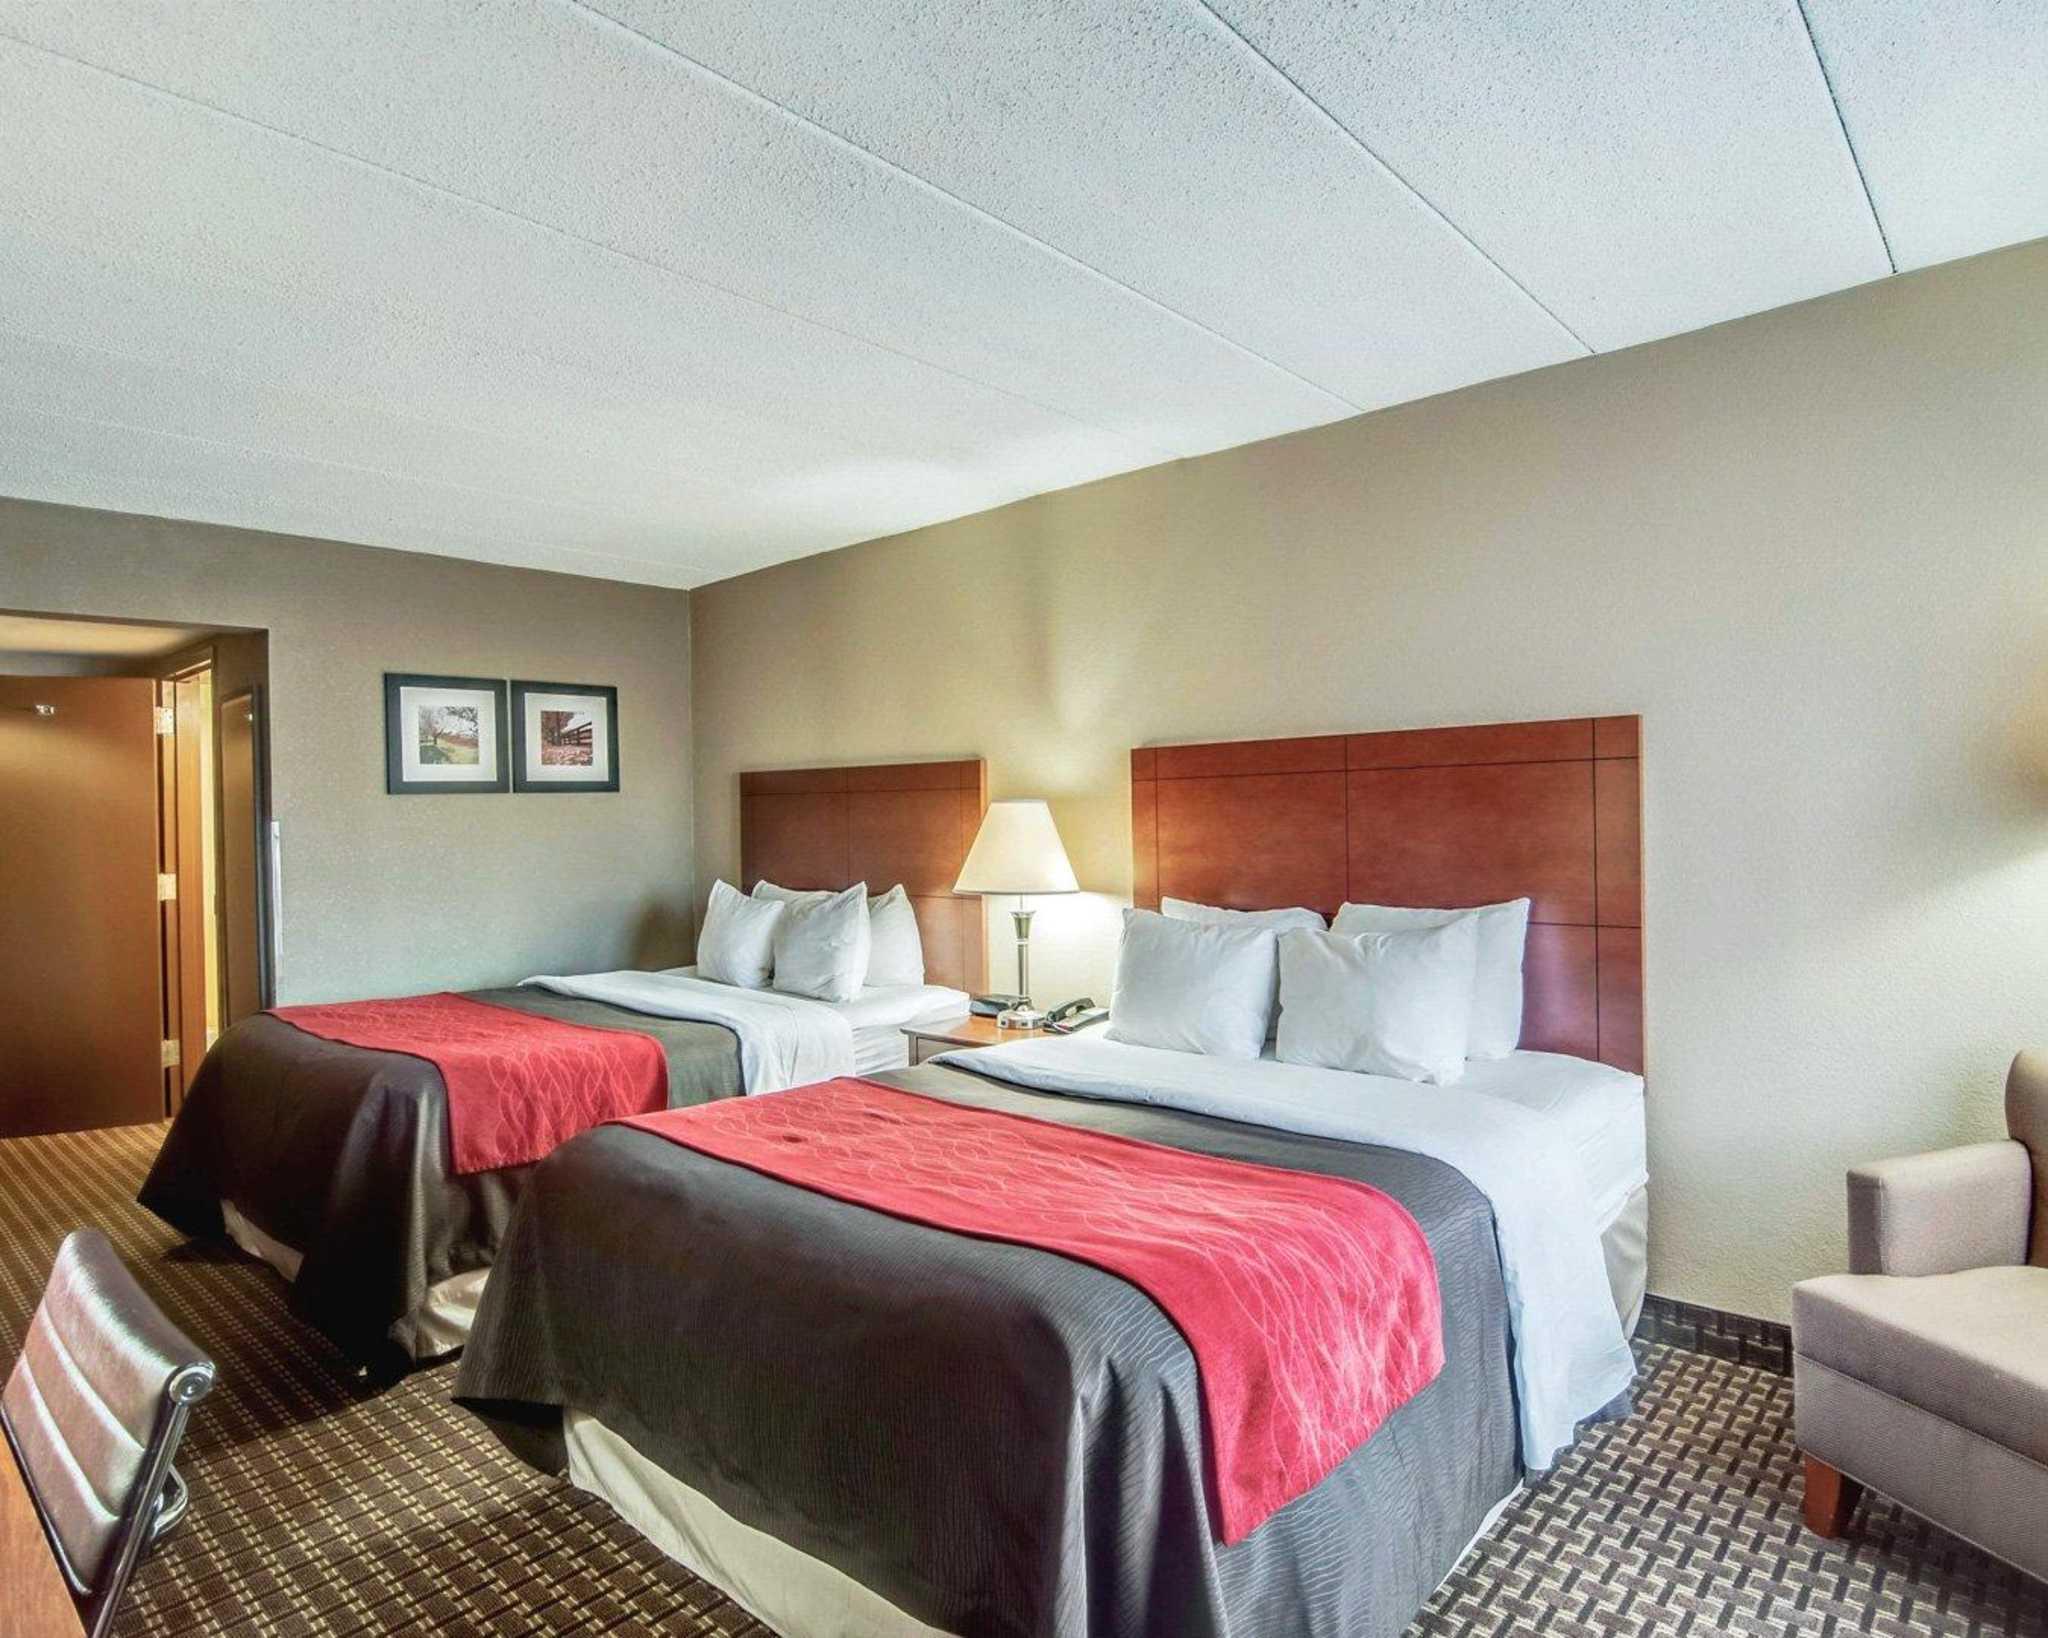 Comfort Inn & Suites image 0